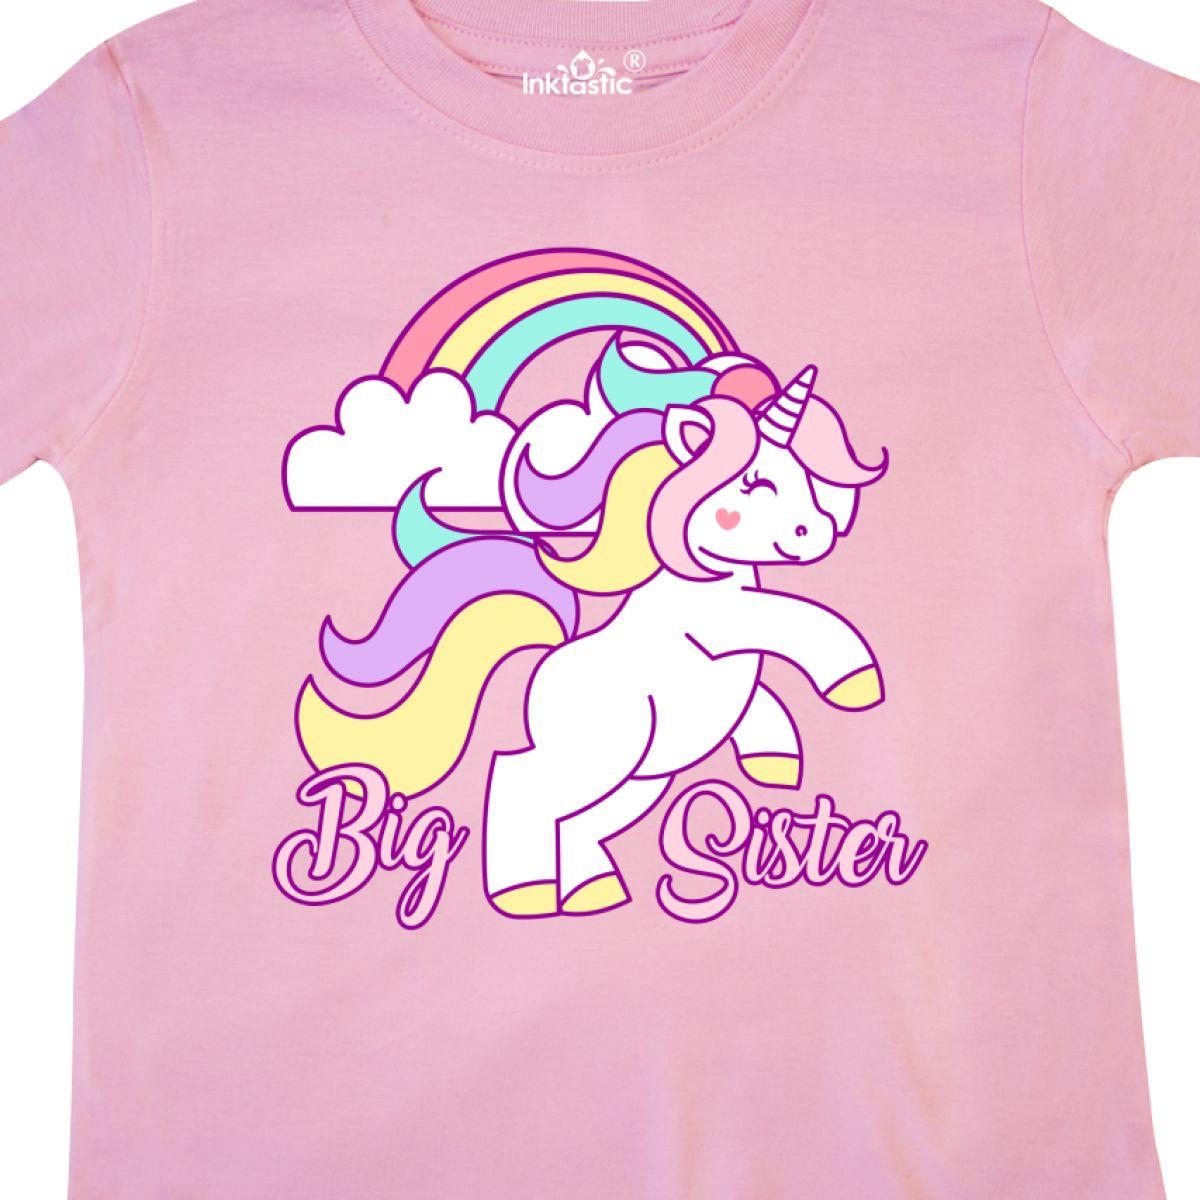 Inktastic-Big-Sister-Unicorn-Toddler-T-Shirt-Fantasy-Happy-Child-Preschooler-Kid thumbnail 8